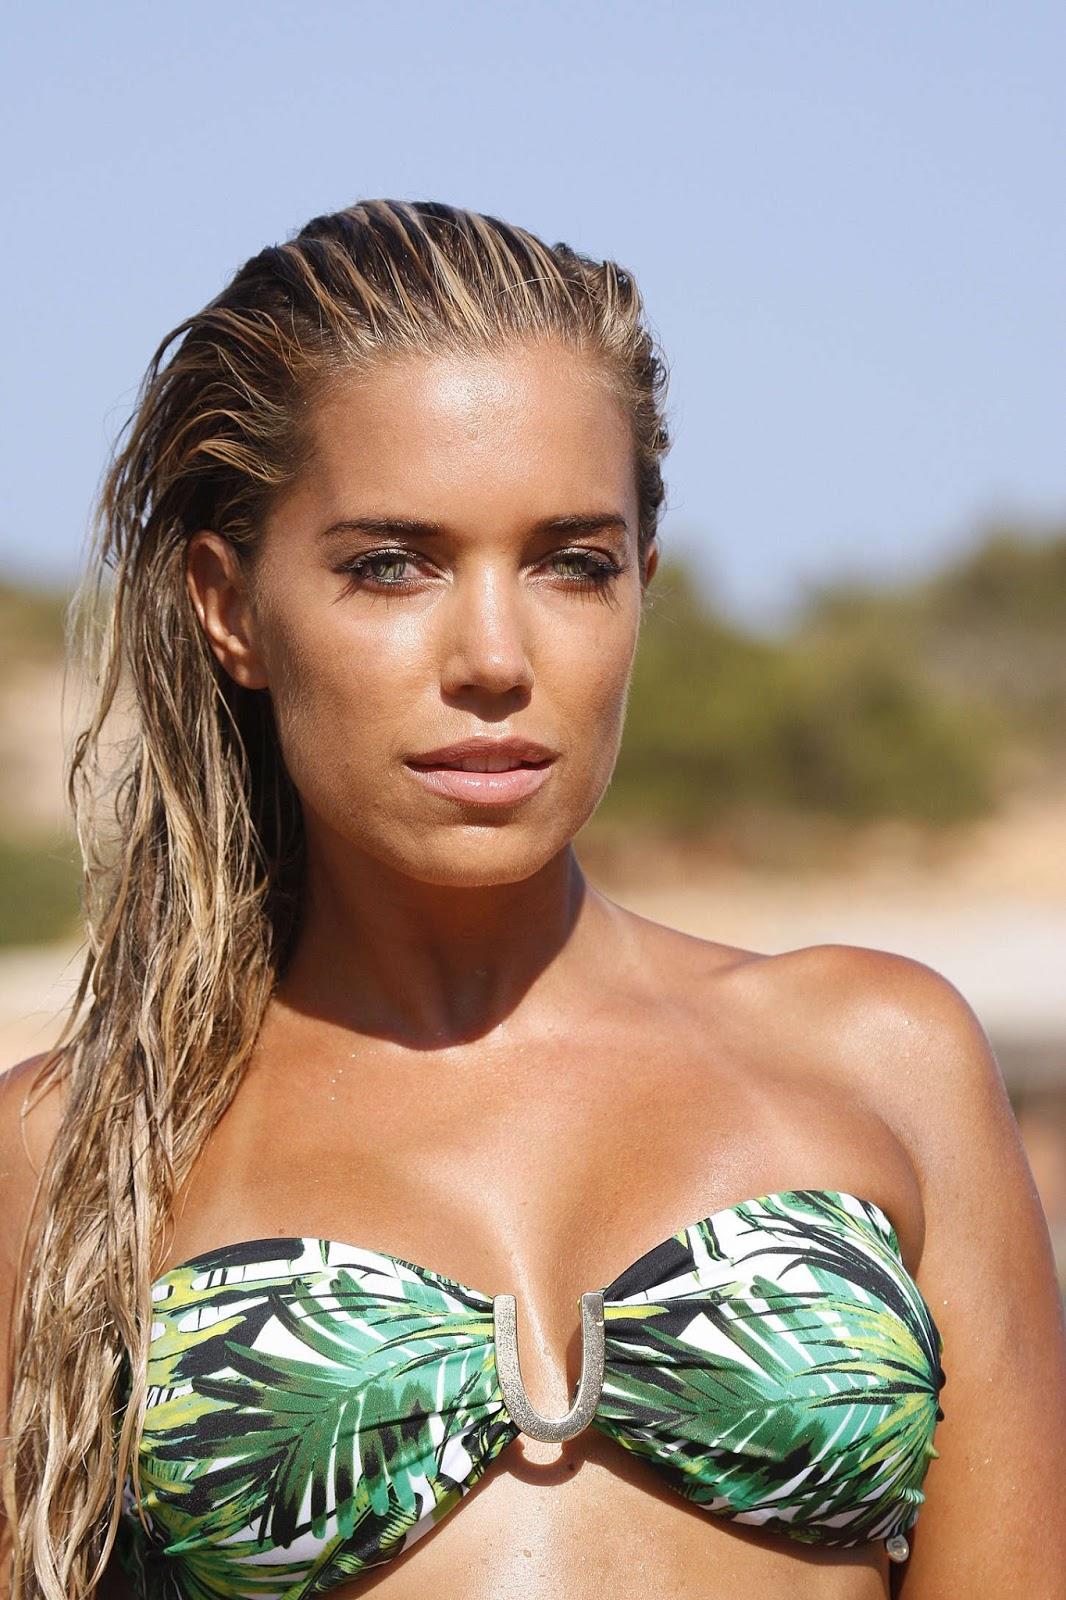 international celebrities sylvie van der vaart bikini photoshoot in ibiza. Black Bedroom Furniture Sets. Home Design Ideas